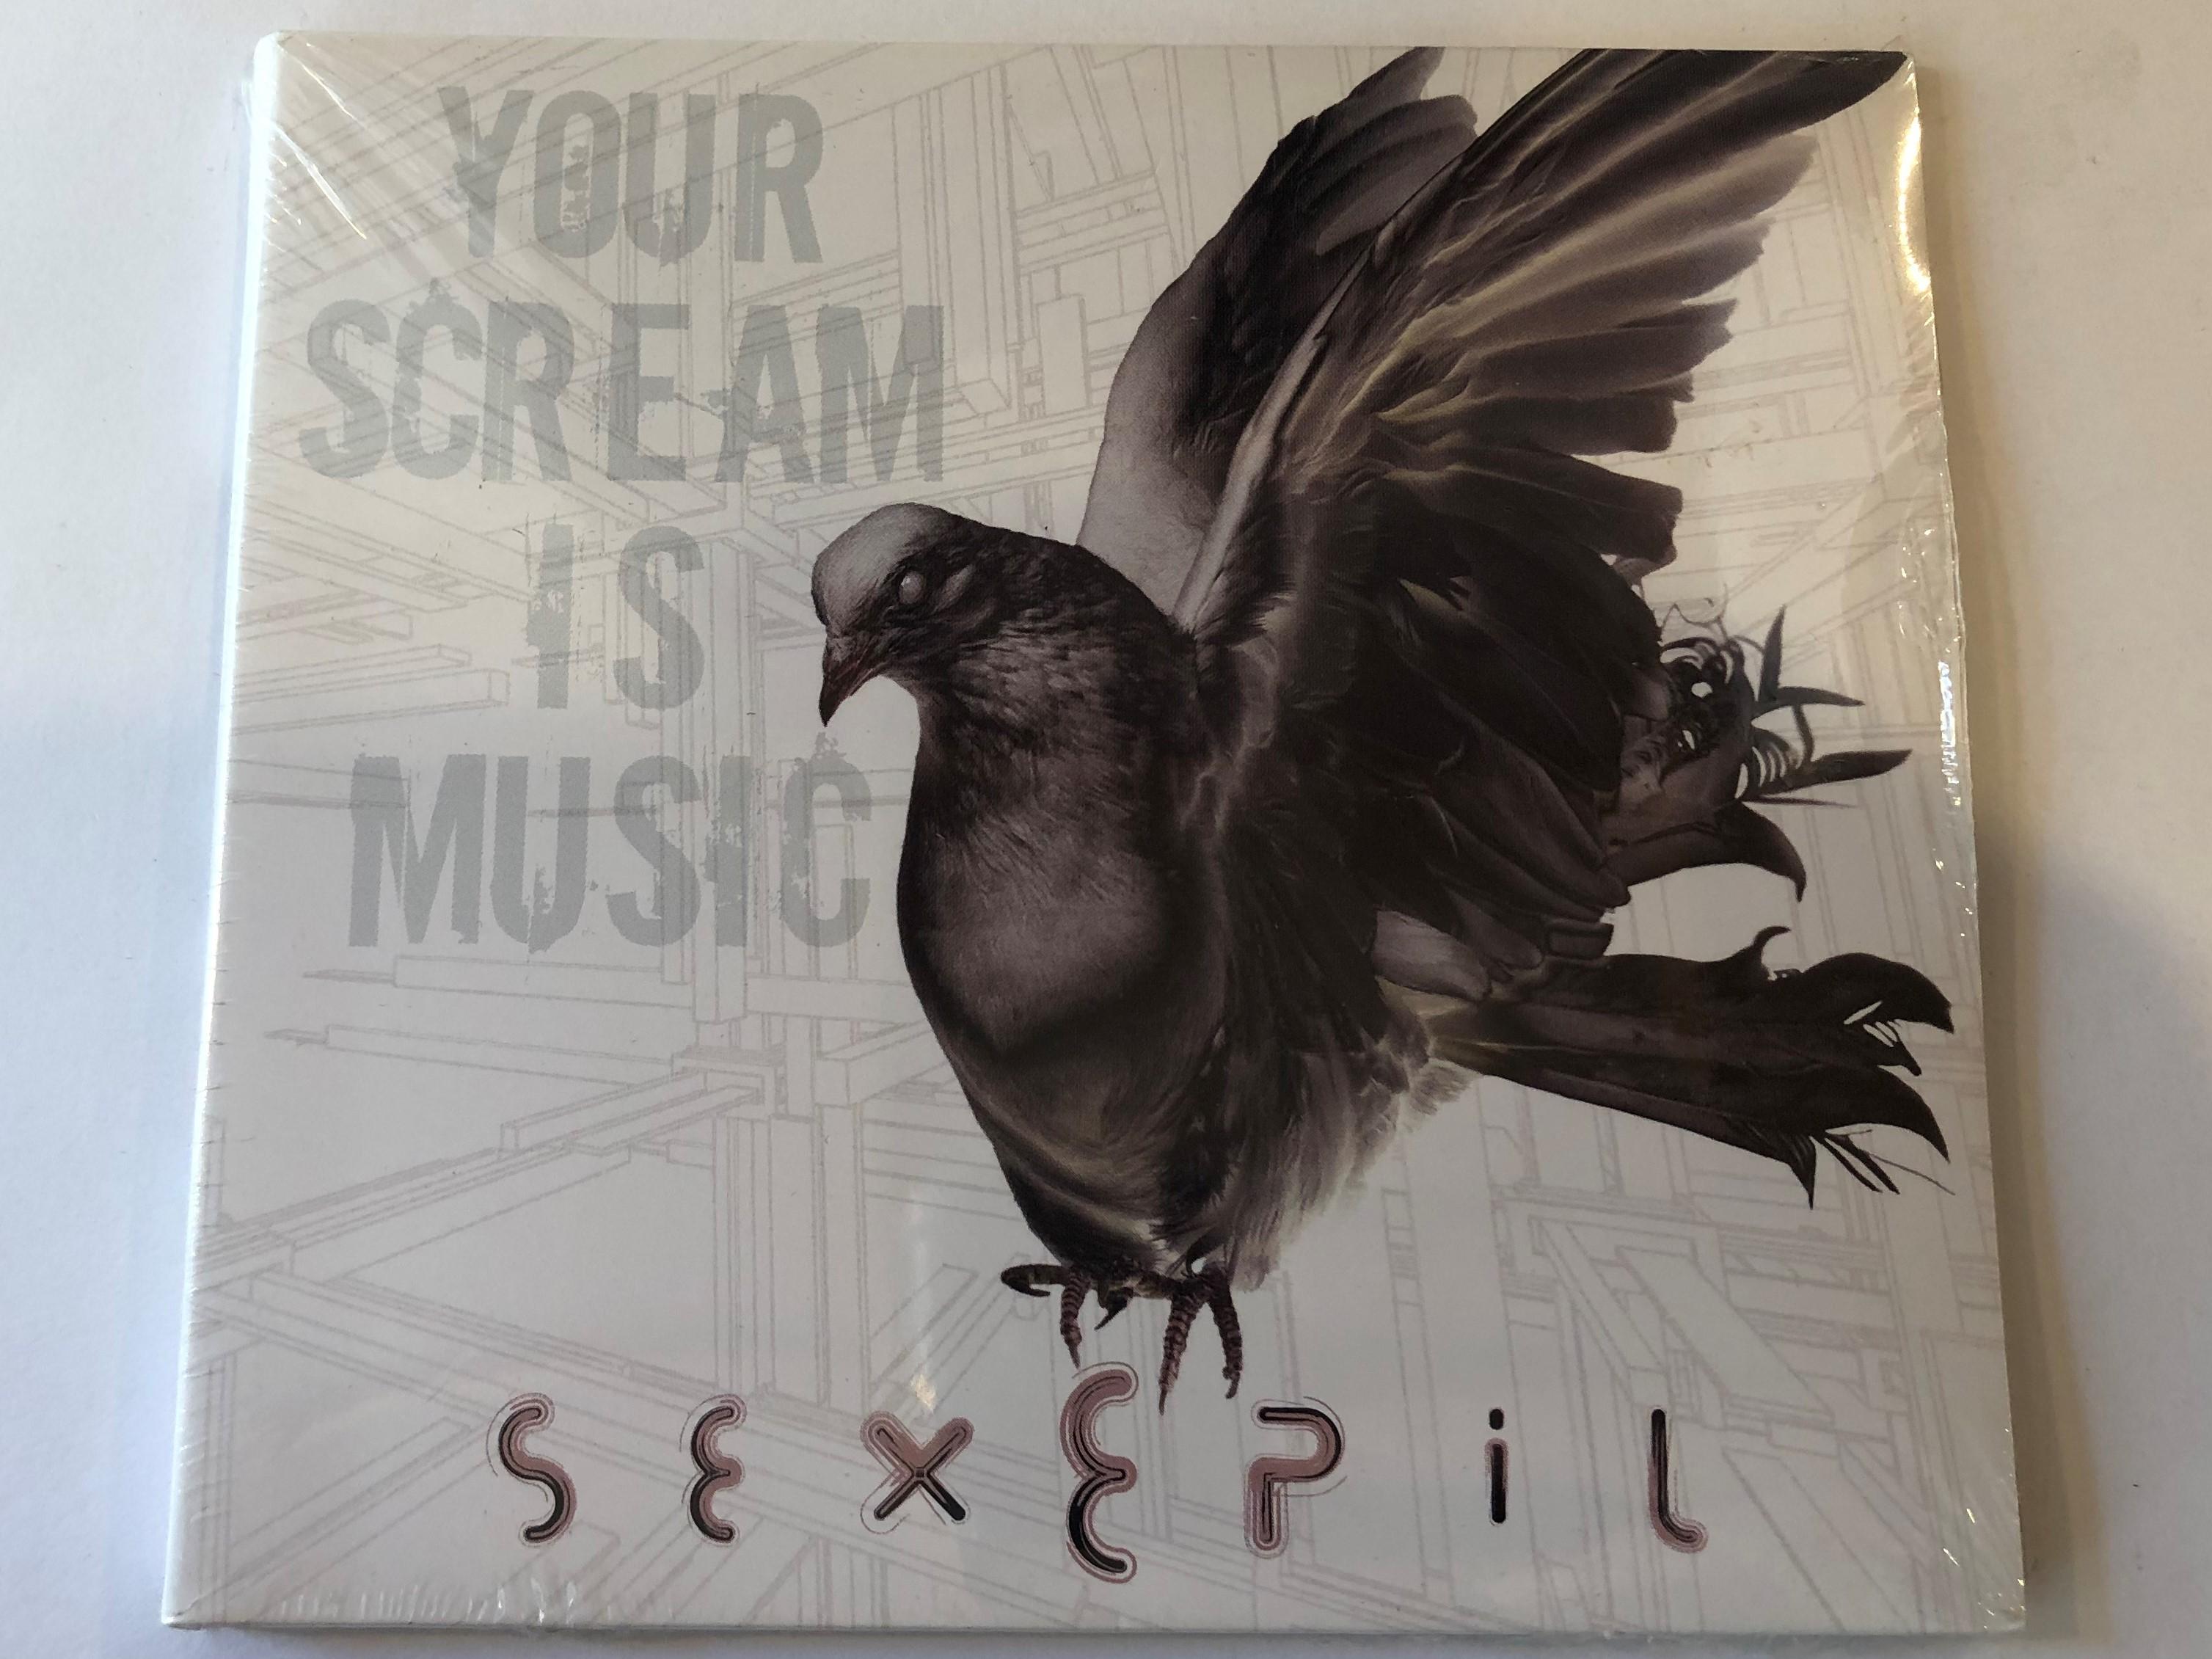 sexepil-your-scream-is-music-audio-cd-859711708893-1-.jpg